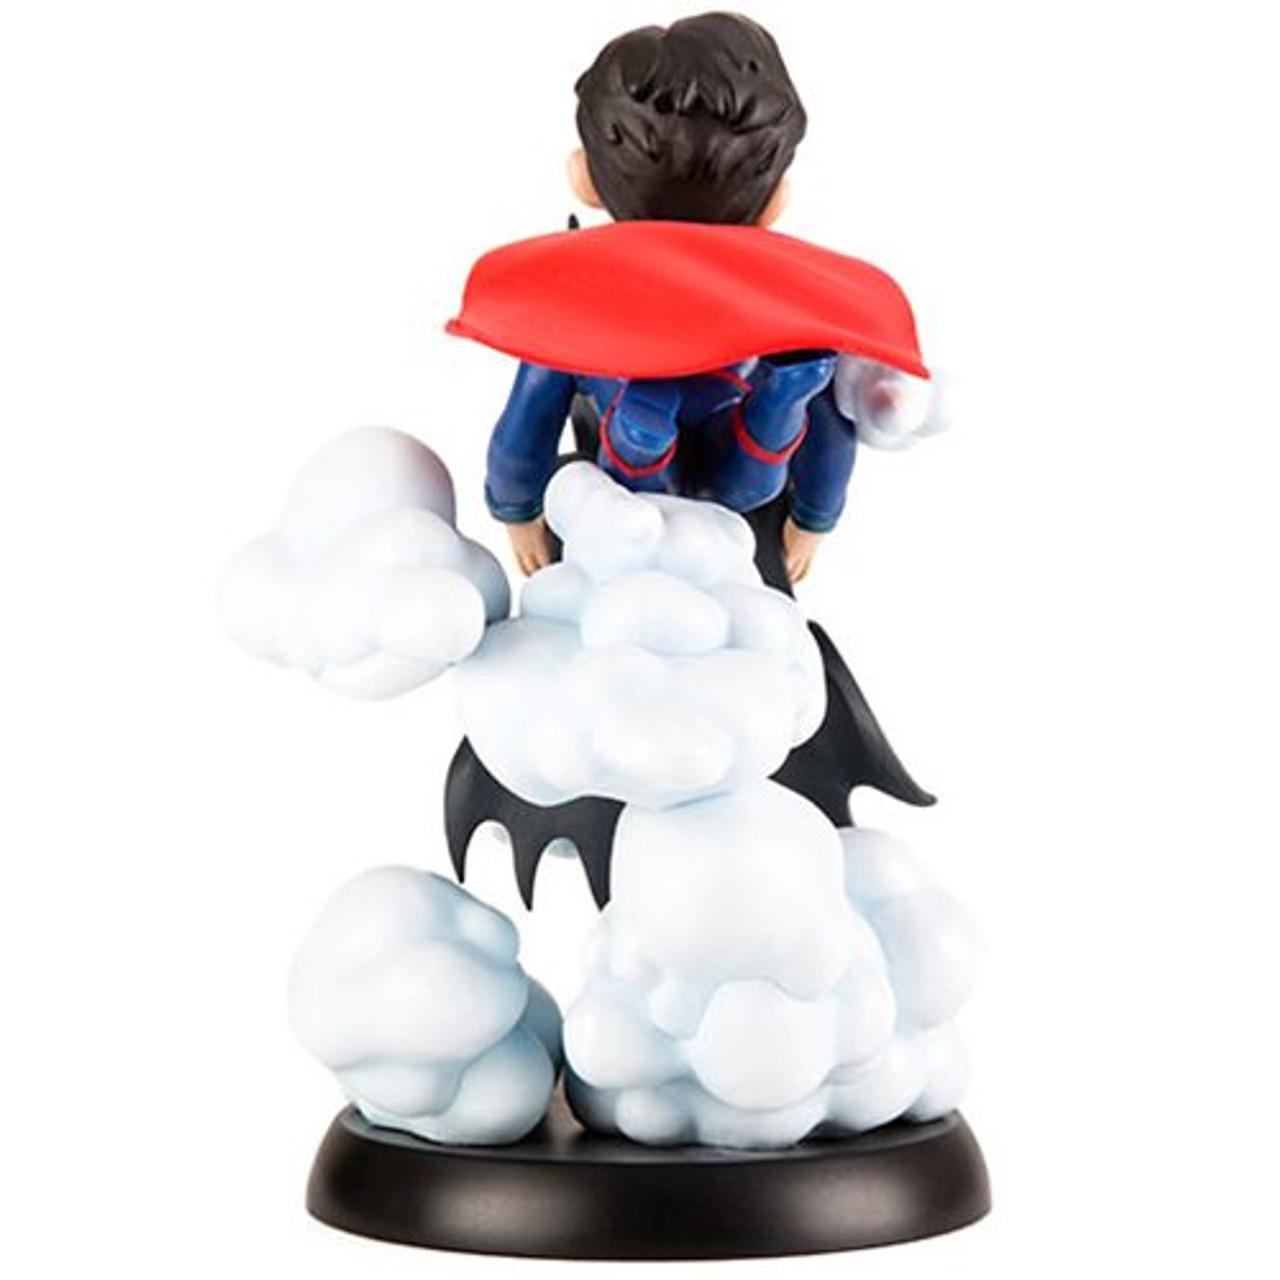 Killing Joke DC Q-Fig Max Toons The Joker 4-Inch Figure